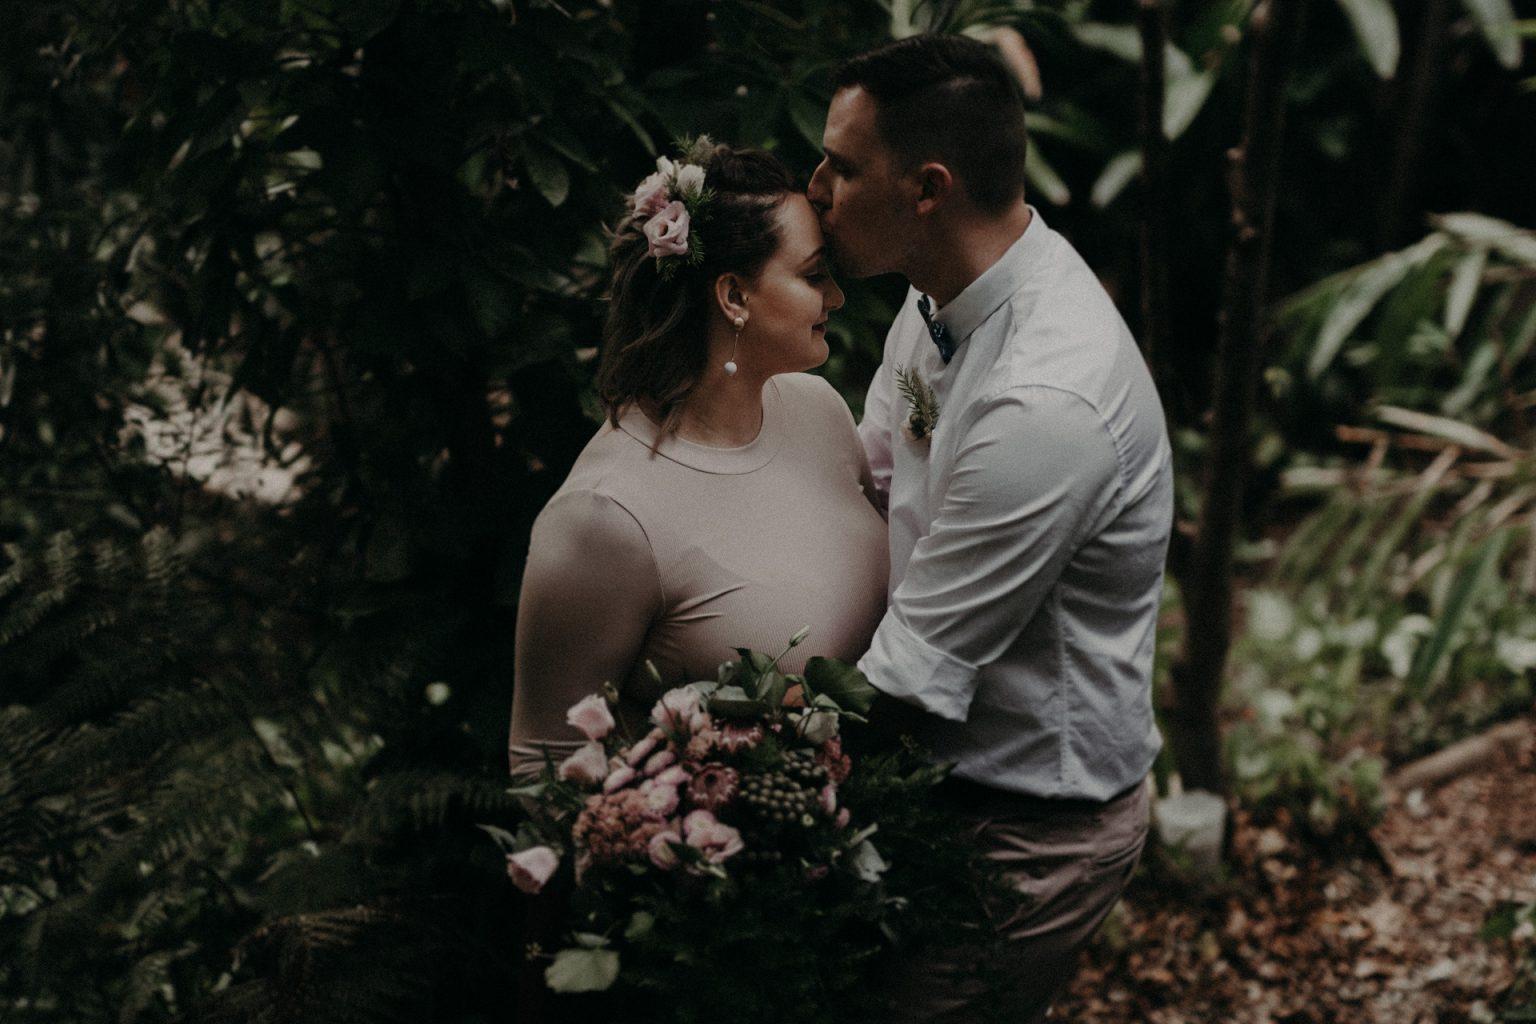 bride and groom in garden bouquet pink dress  kiss